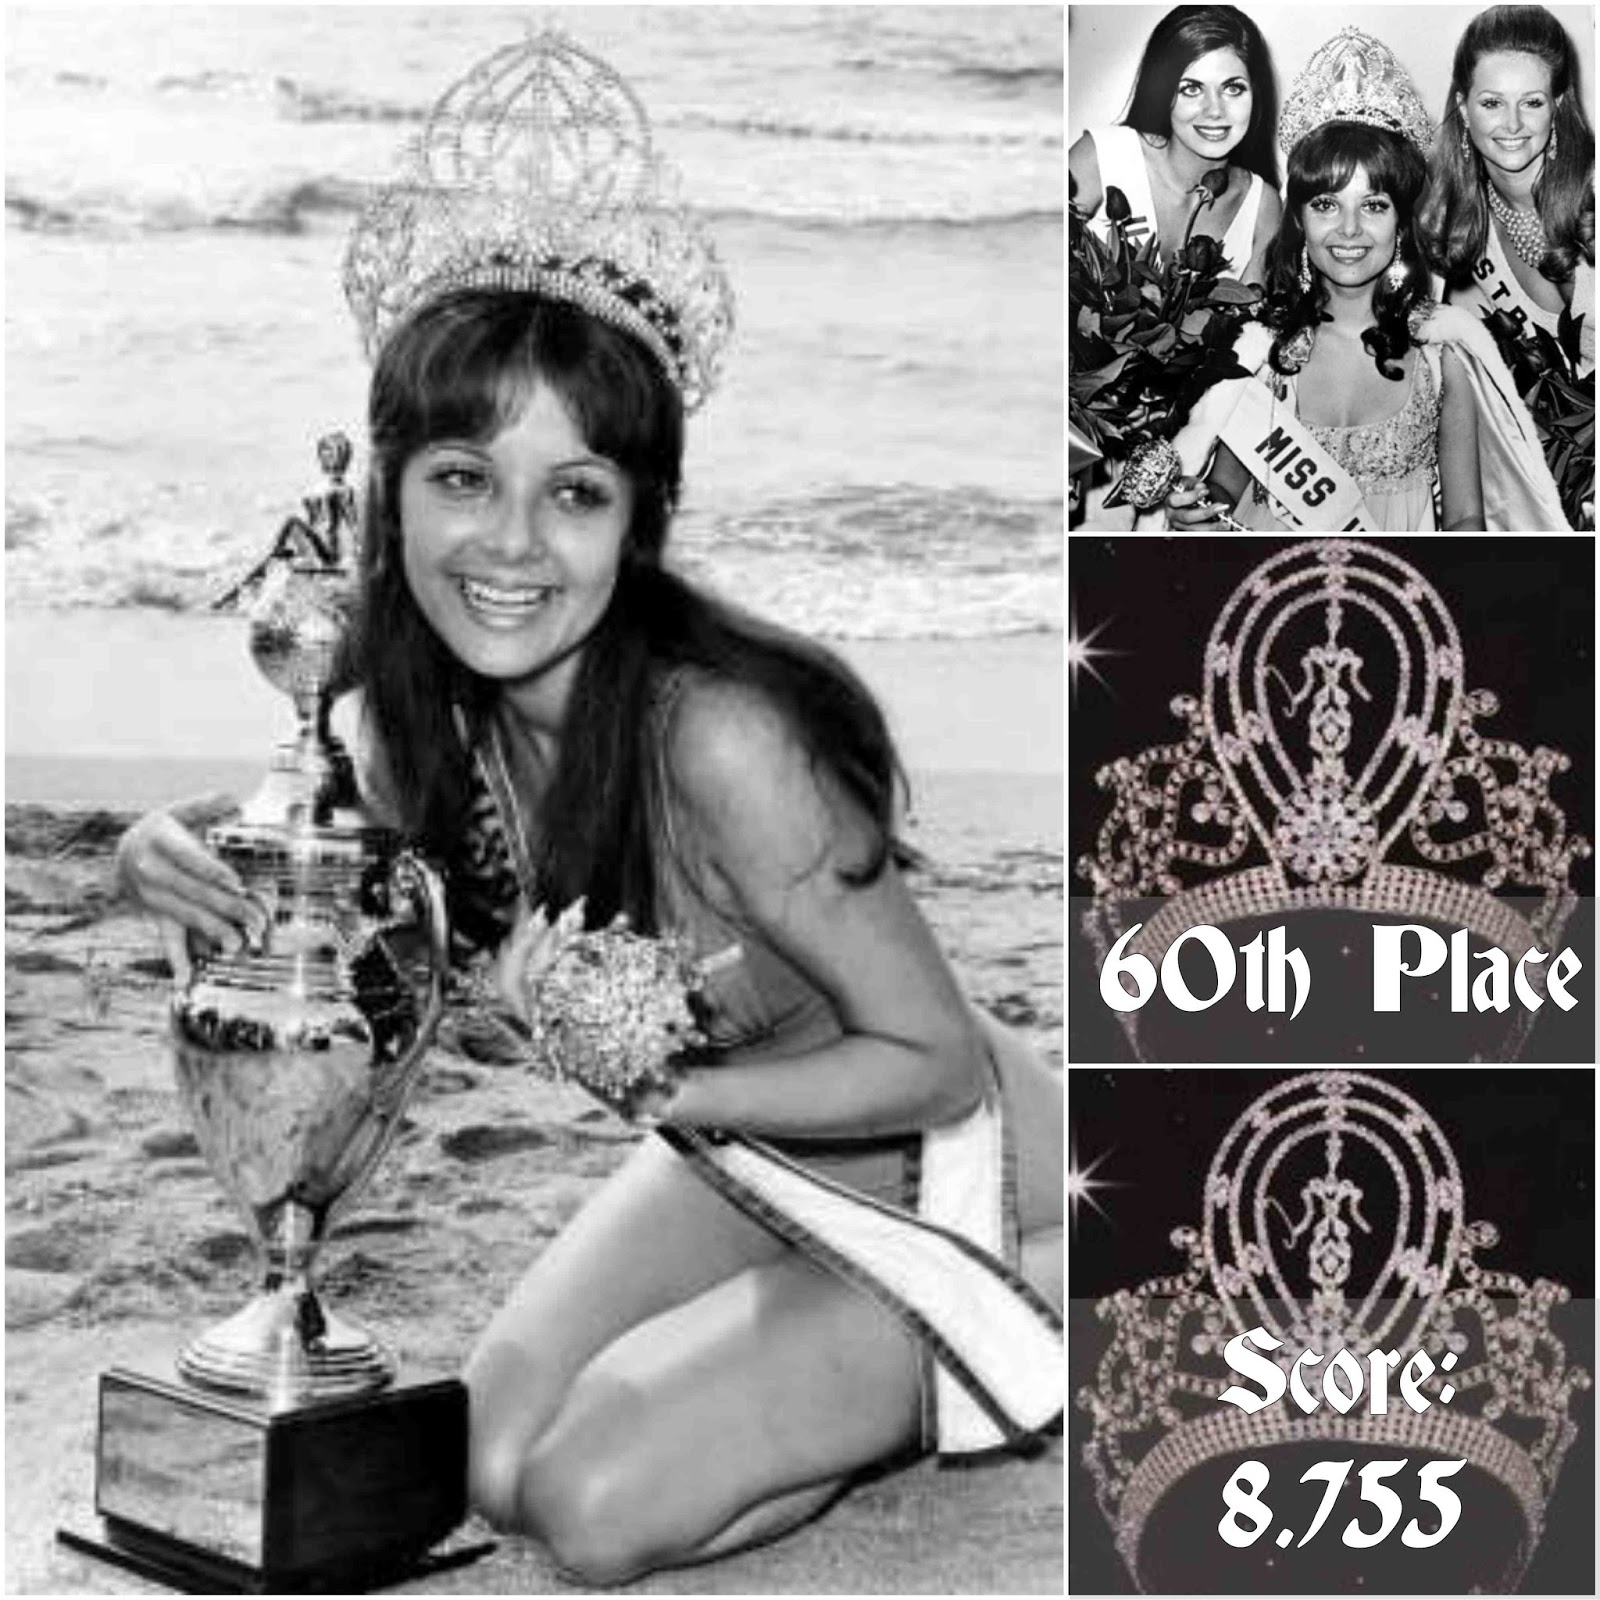 Stephane Paquette,Evonne Goolagong 7 Grand Slam singles titles Porn photos Ana Claudia Michels 2 1999-2000,Martine Beswick (born 1941 (born in Port Antonio, Jamaica)